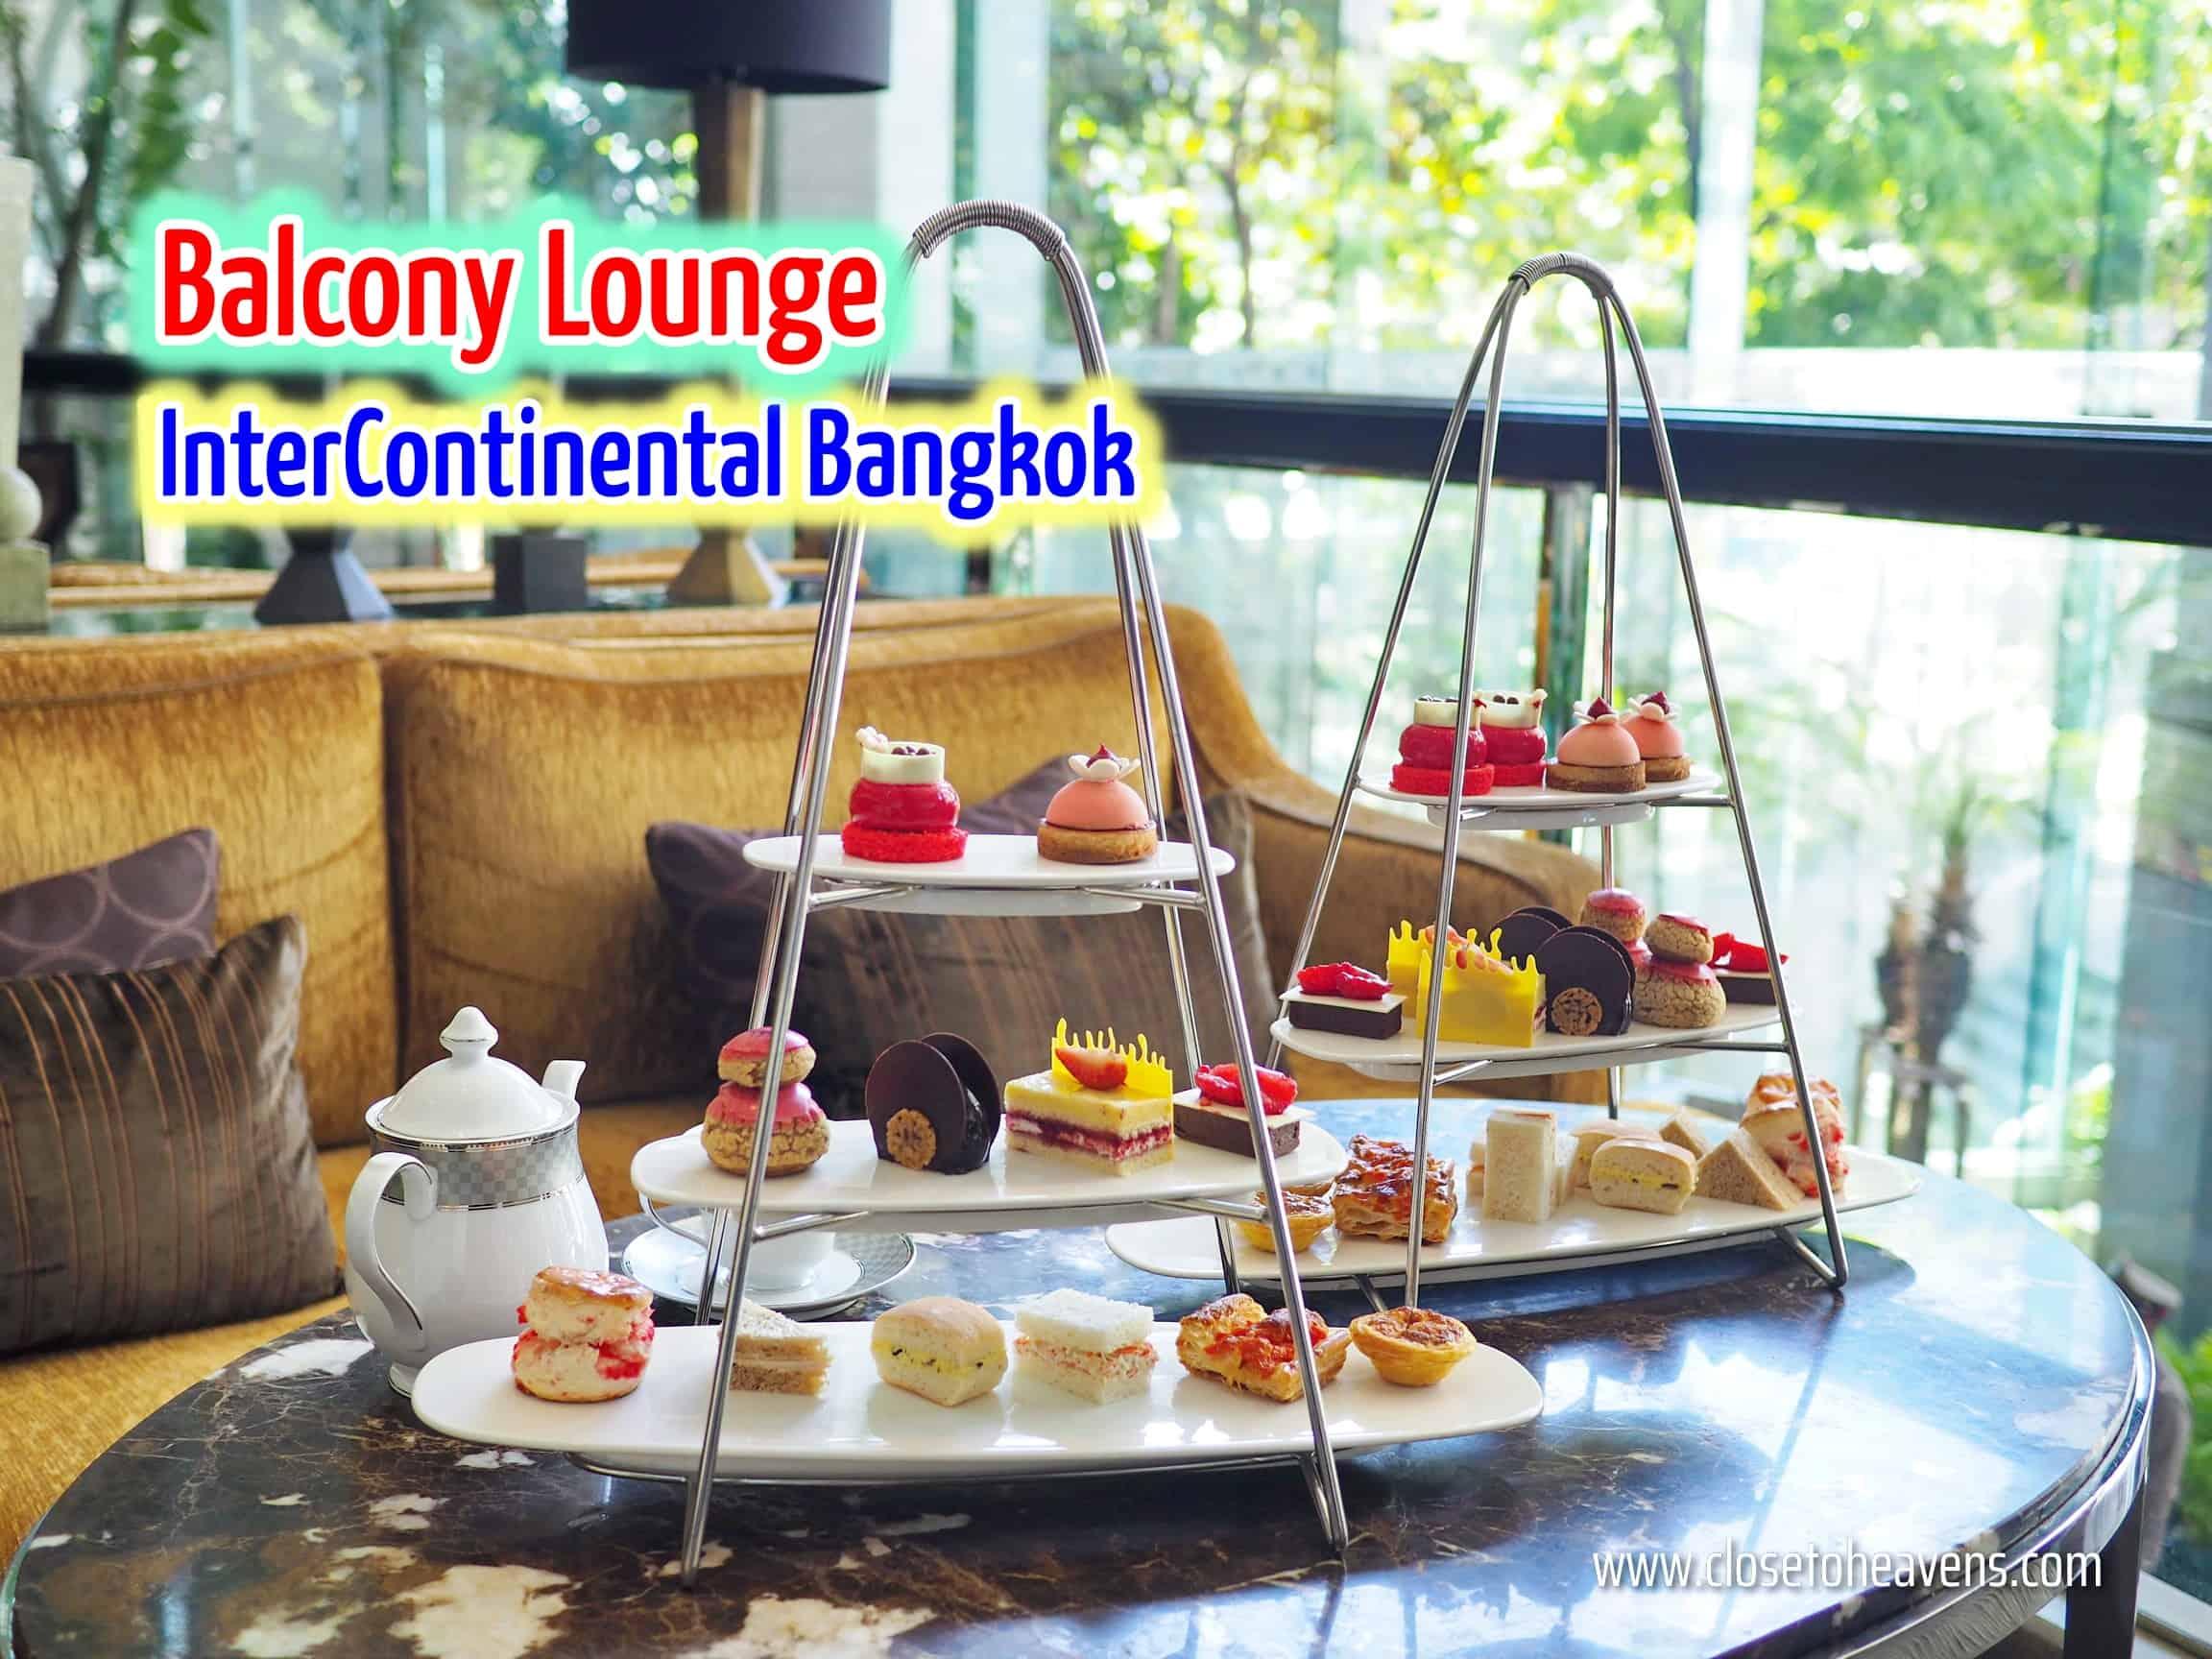 Cherry afternoon tea set @ Balcony Lounge, InterContinental Bangkok